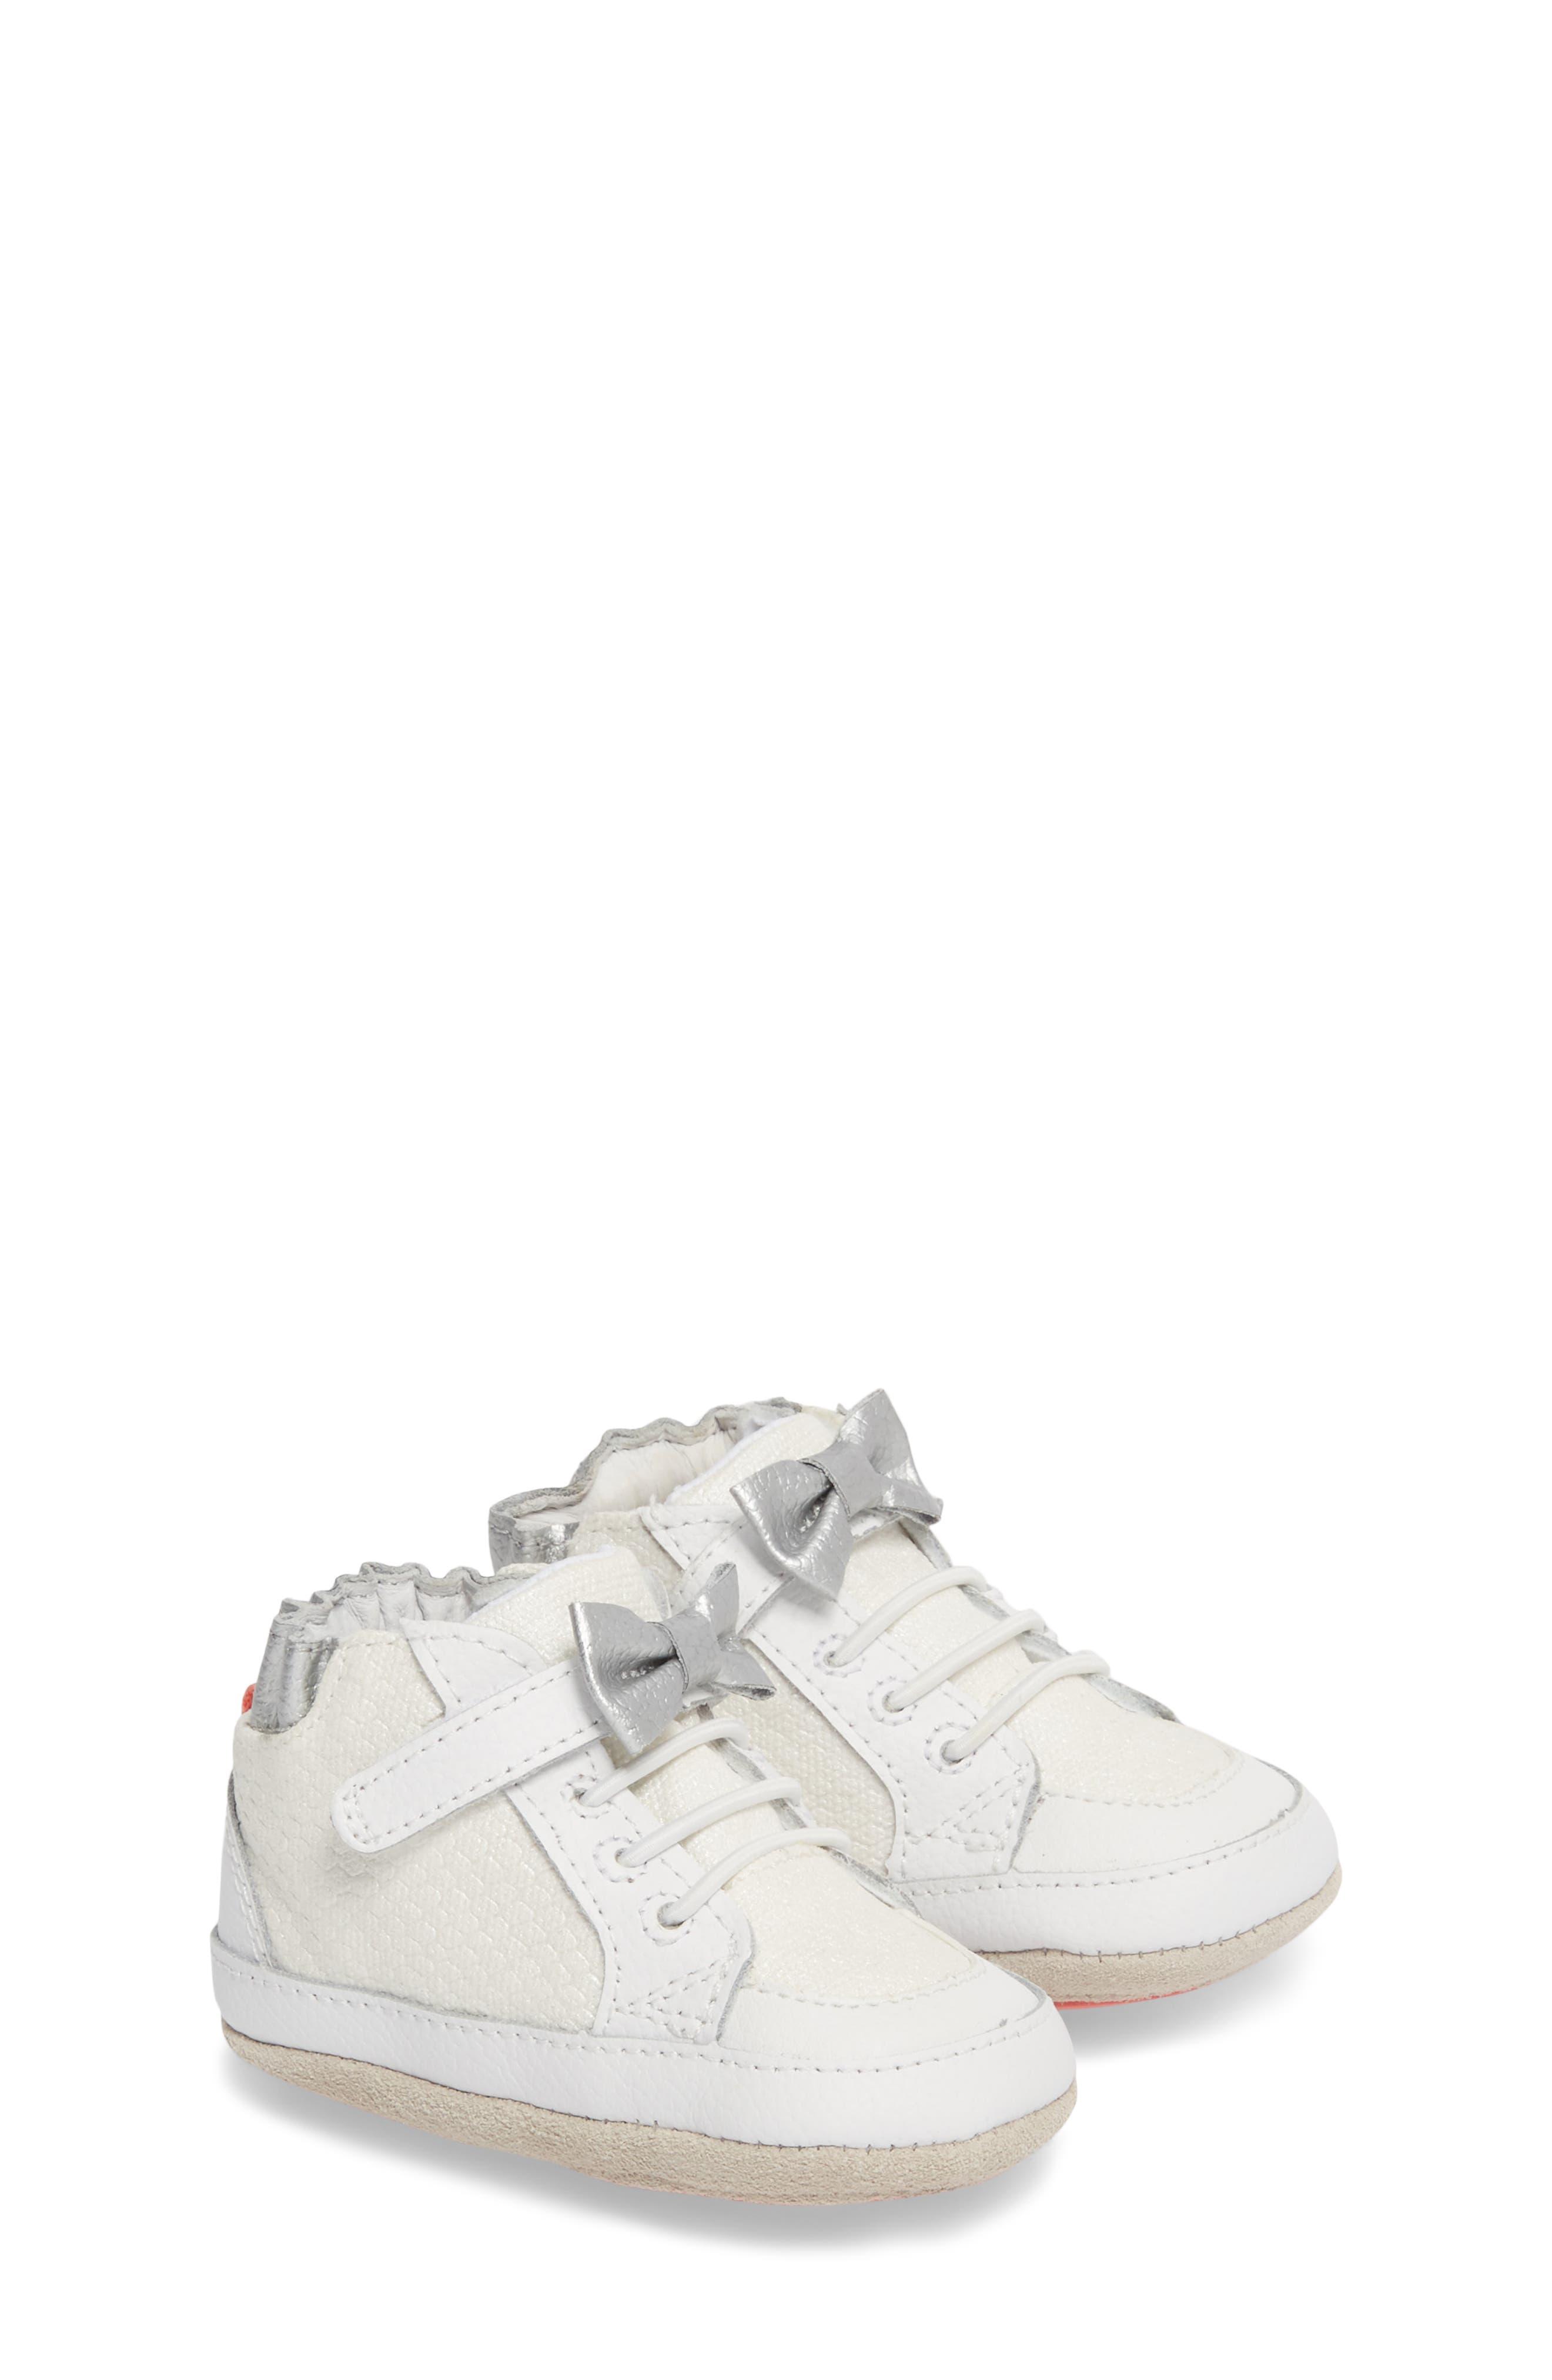 ROBEEZ<SUP>®</SUP>, Skipping Stella Sneaker, Main thumbnail 1, color, 100